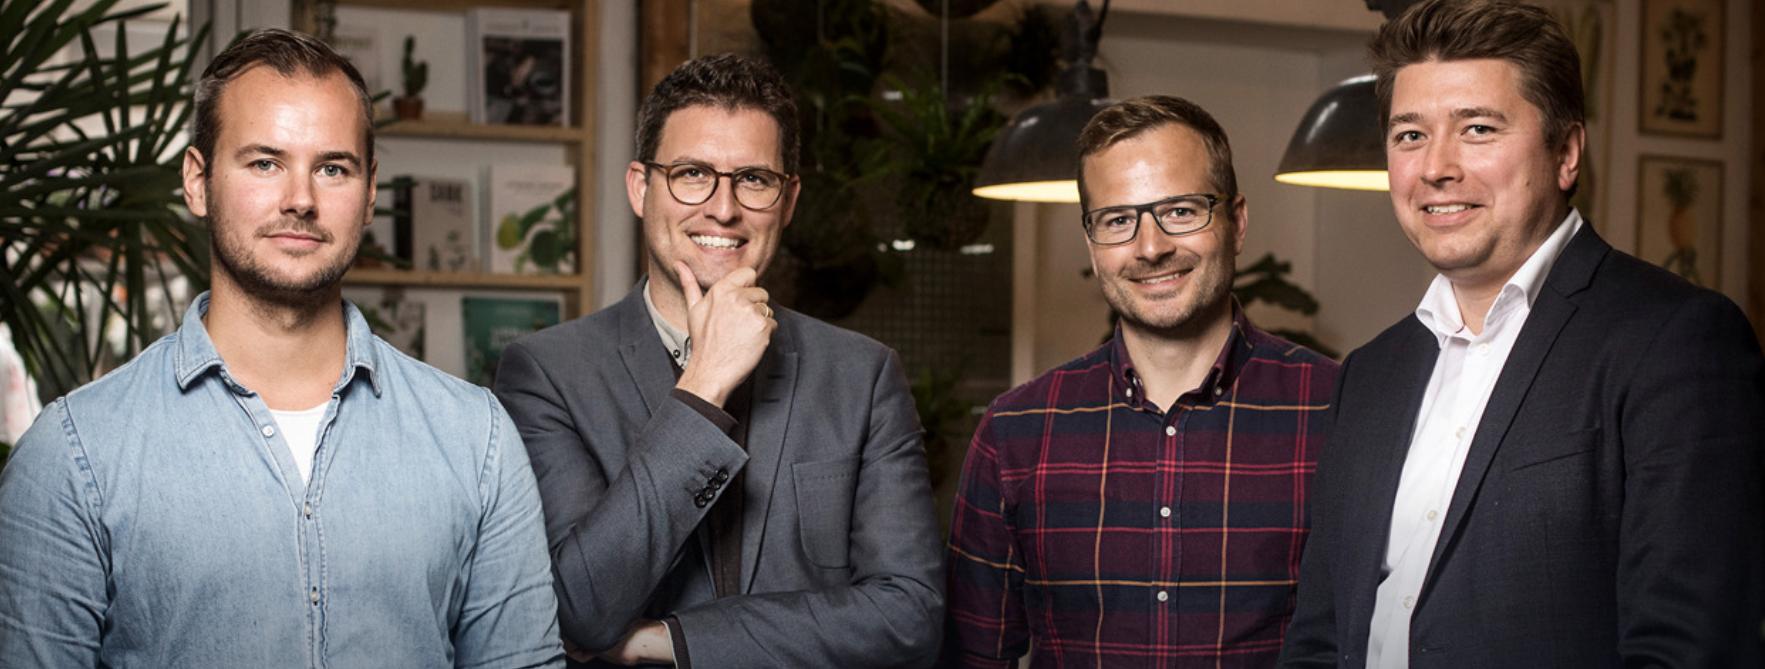 Gaest bilde founders